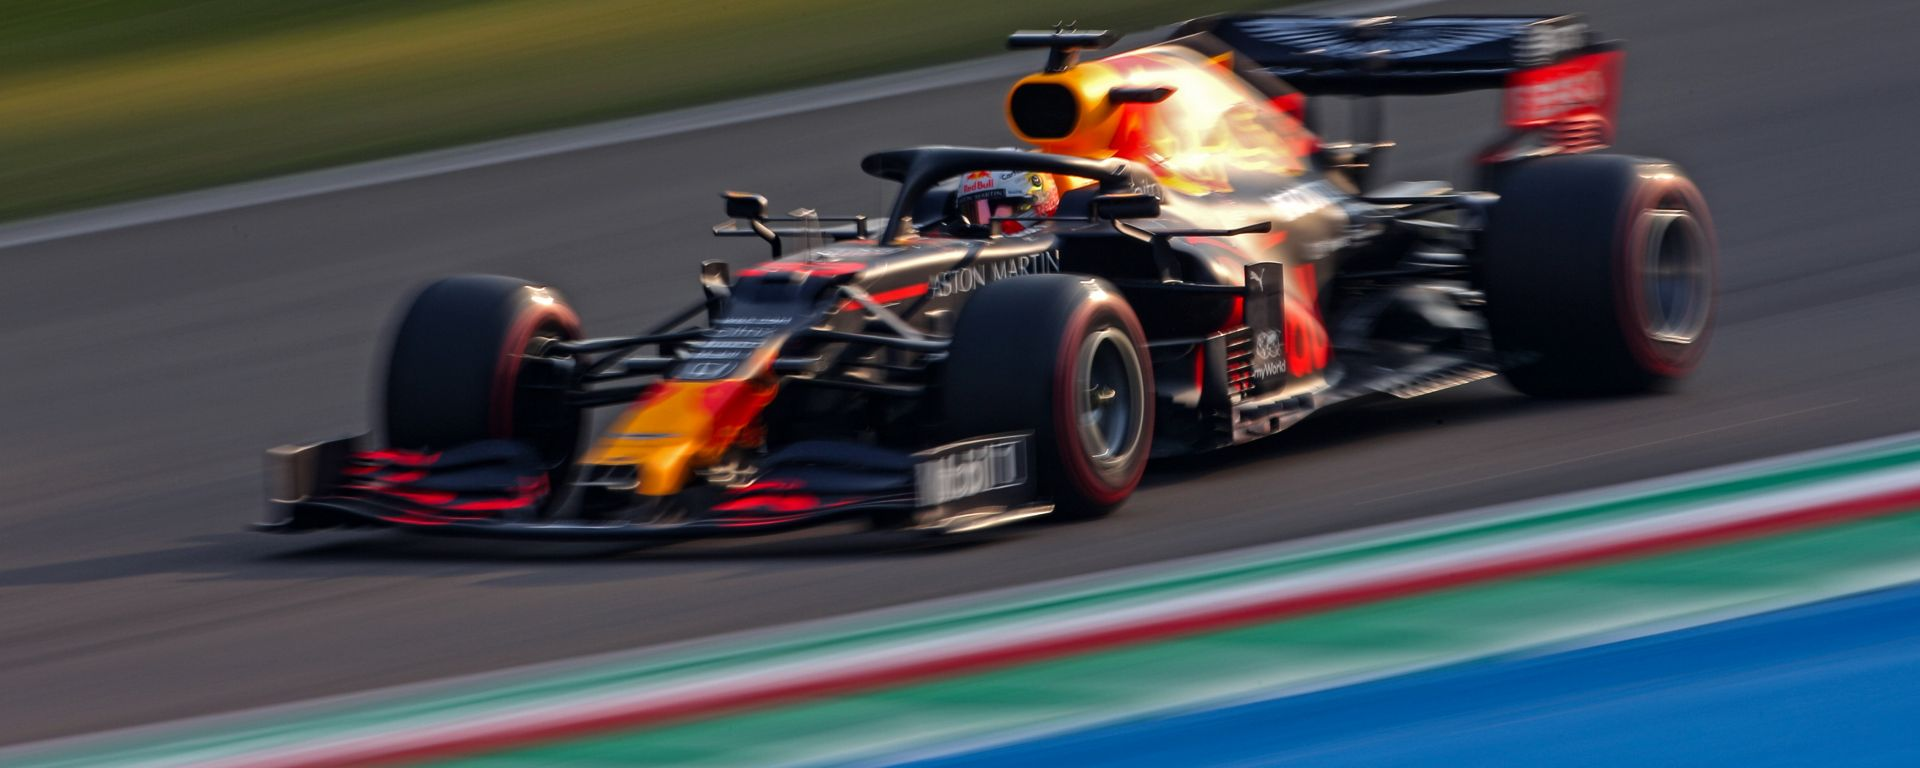 F1 GP Emilia Romagna 2020, Imola: Max Verstappen (Red Bull Racing)